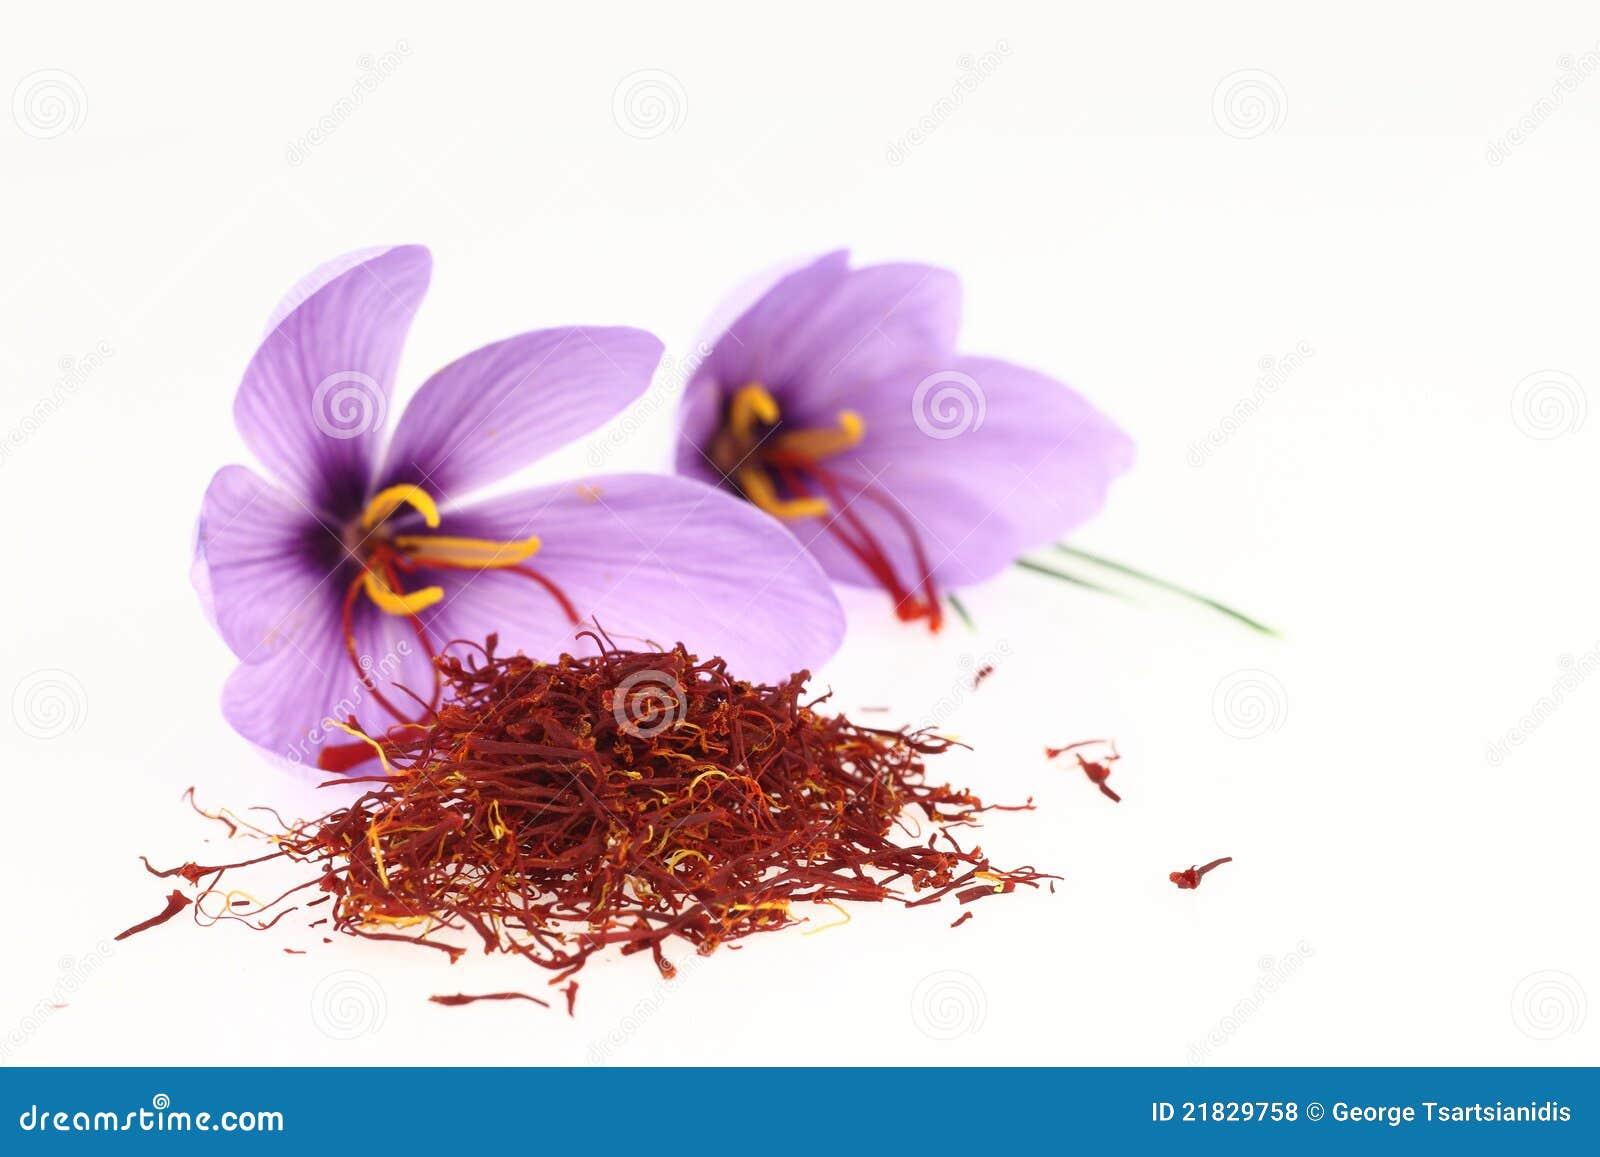 Saffron Spice And Saffron Flowers Royalty Free Stock Photos - Image ...